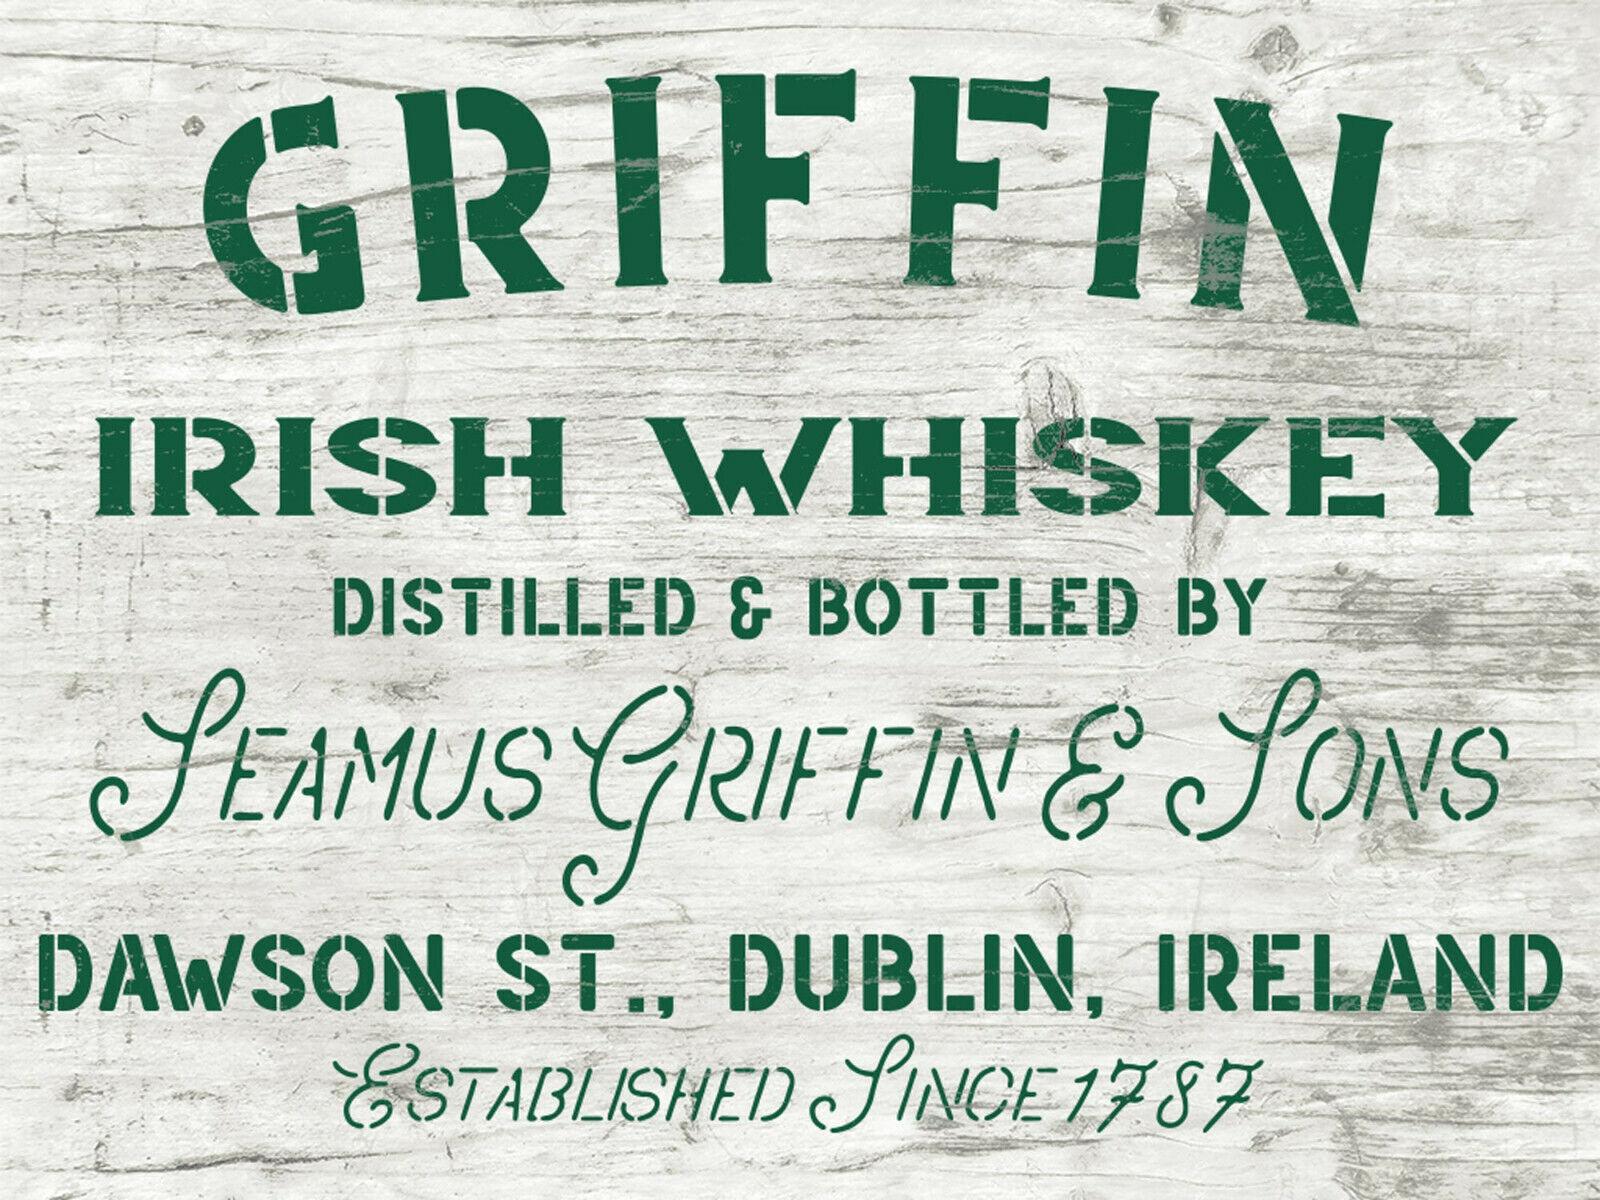 Irish Whiskey Schablone - Hausbar Deko - Whisky Kiste DIY - große Wandschablone